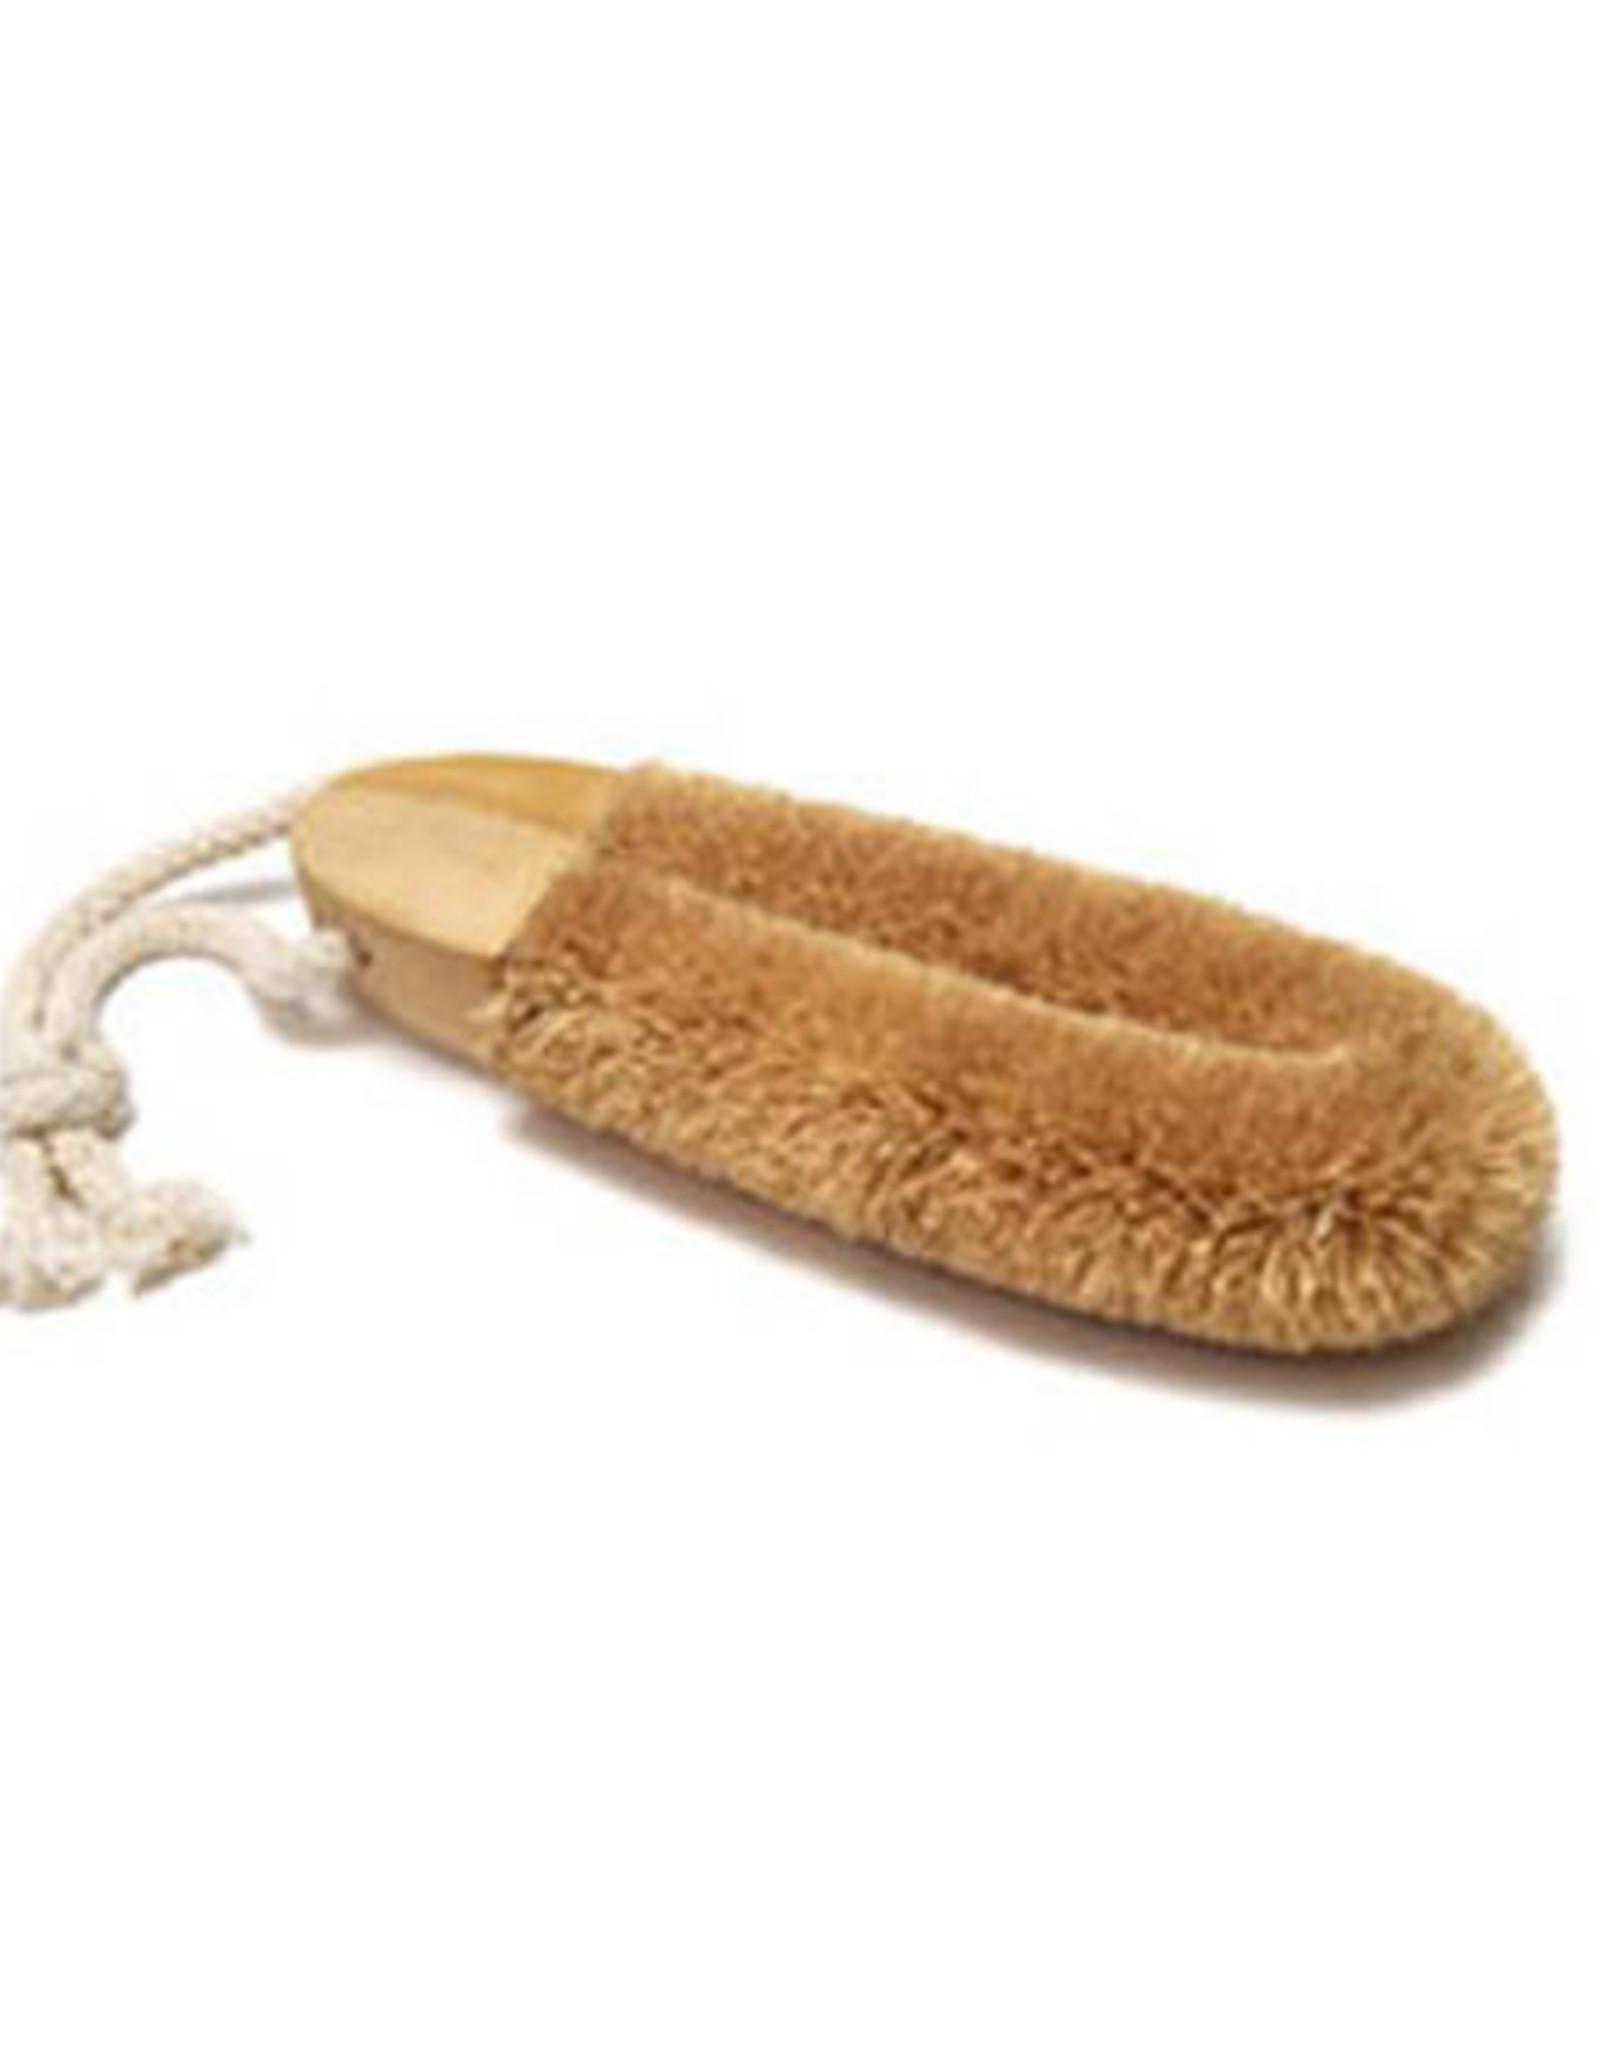 Coconut Foot Brush